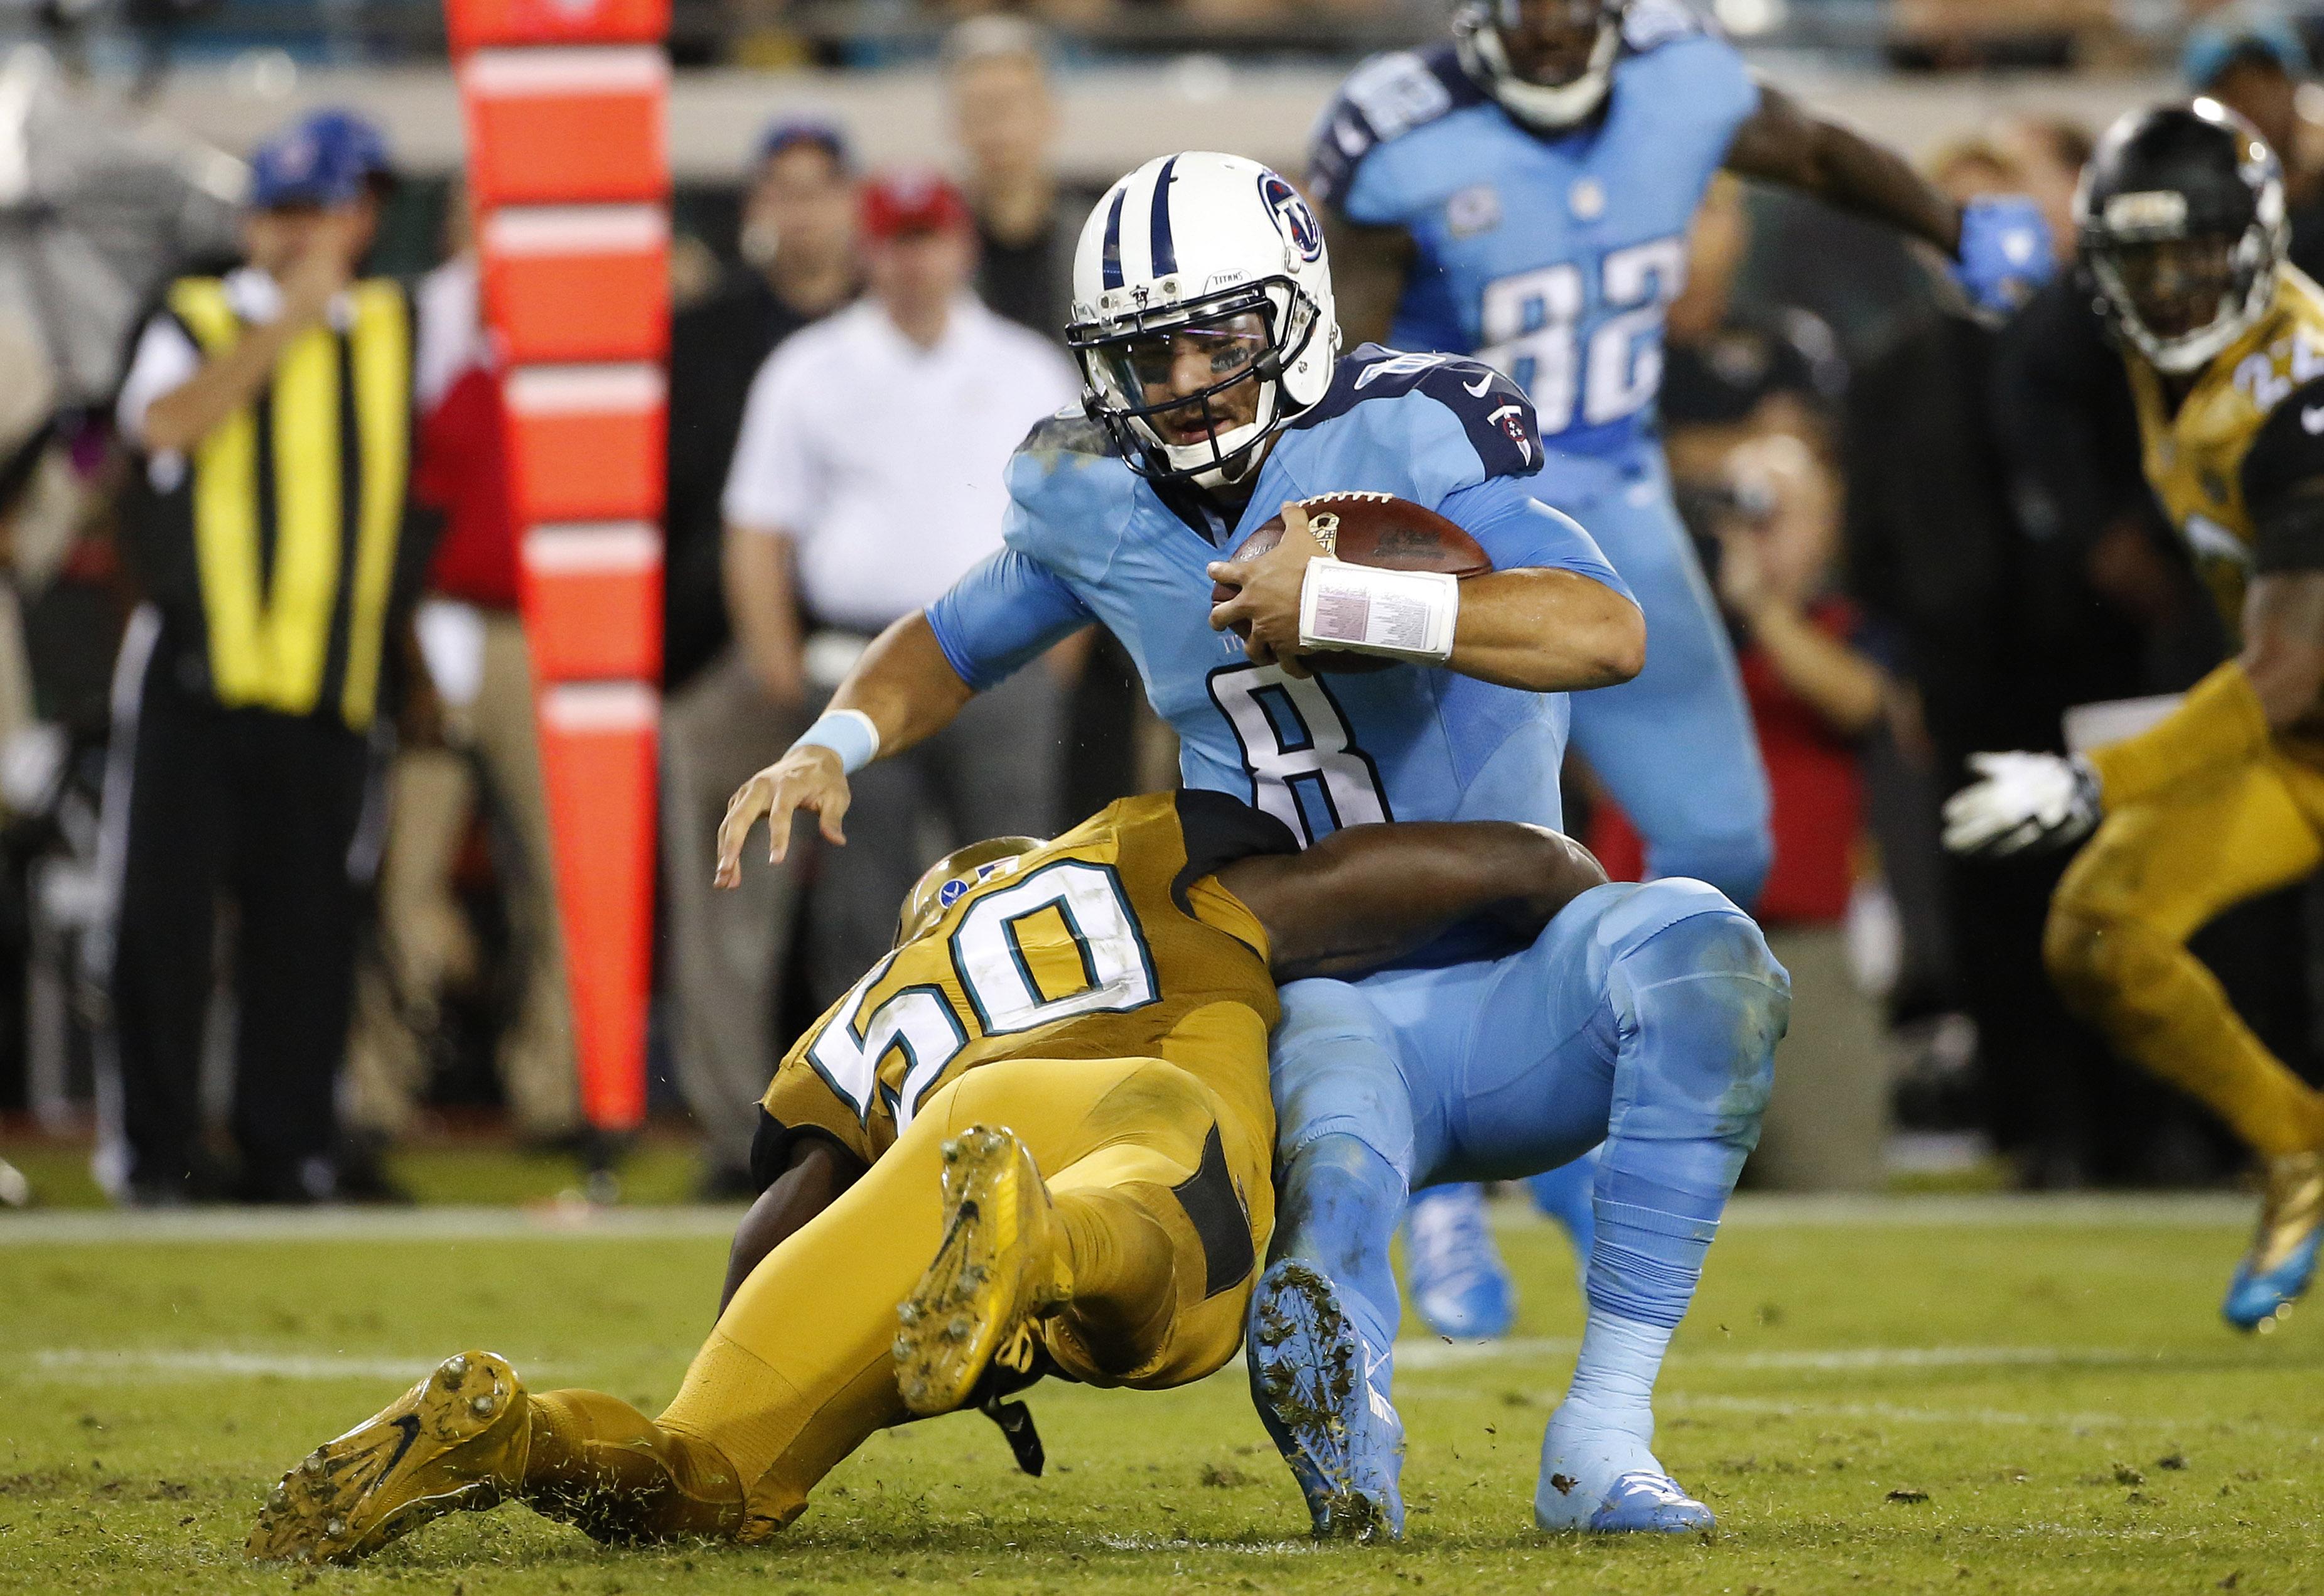 Jacksonville Jaguars outside linebacker Telvin Smith (50) sacks Tennessee Titans quarterback Marcus Mariota (8) during the fourth quarter of an NFL football game Thursday, Nov. 19, 2015, in Jacksonville, Fla. (AP Photo/Brian Blanco)